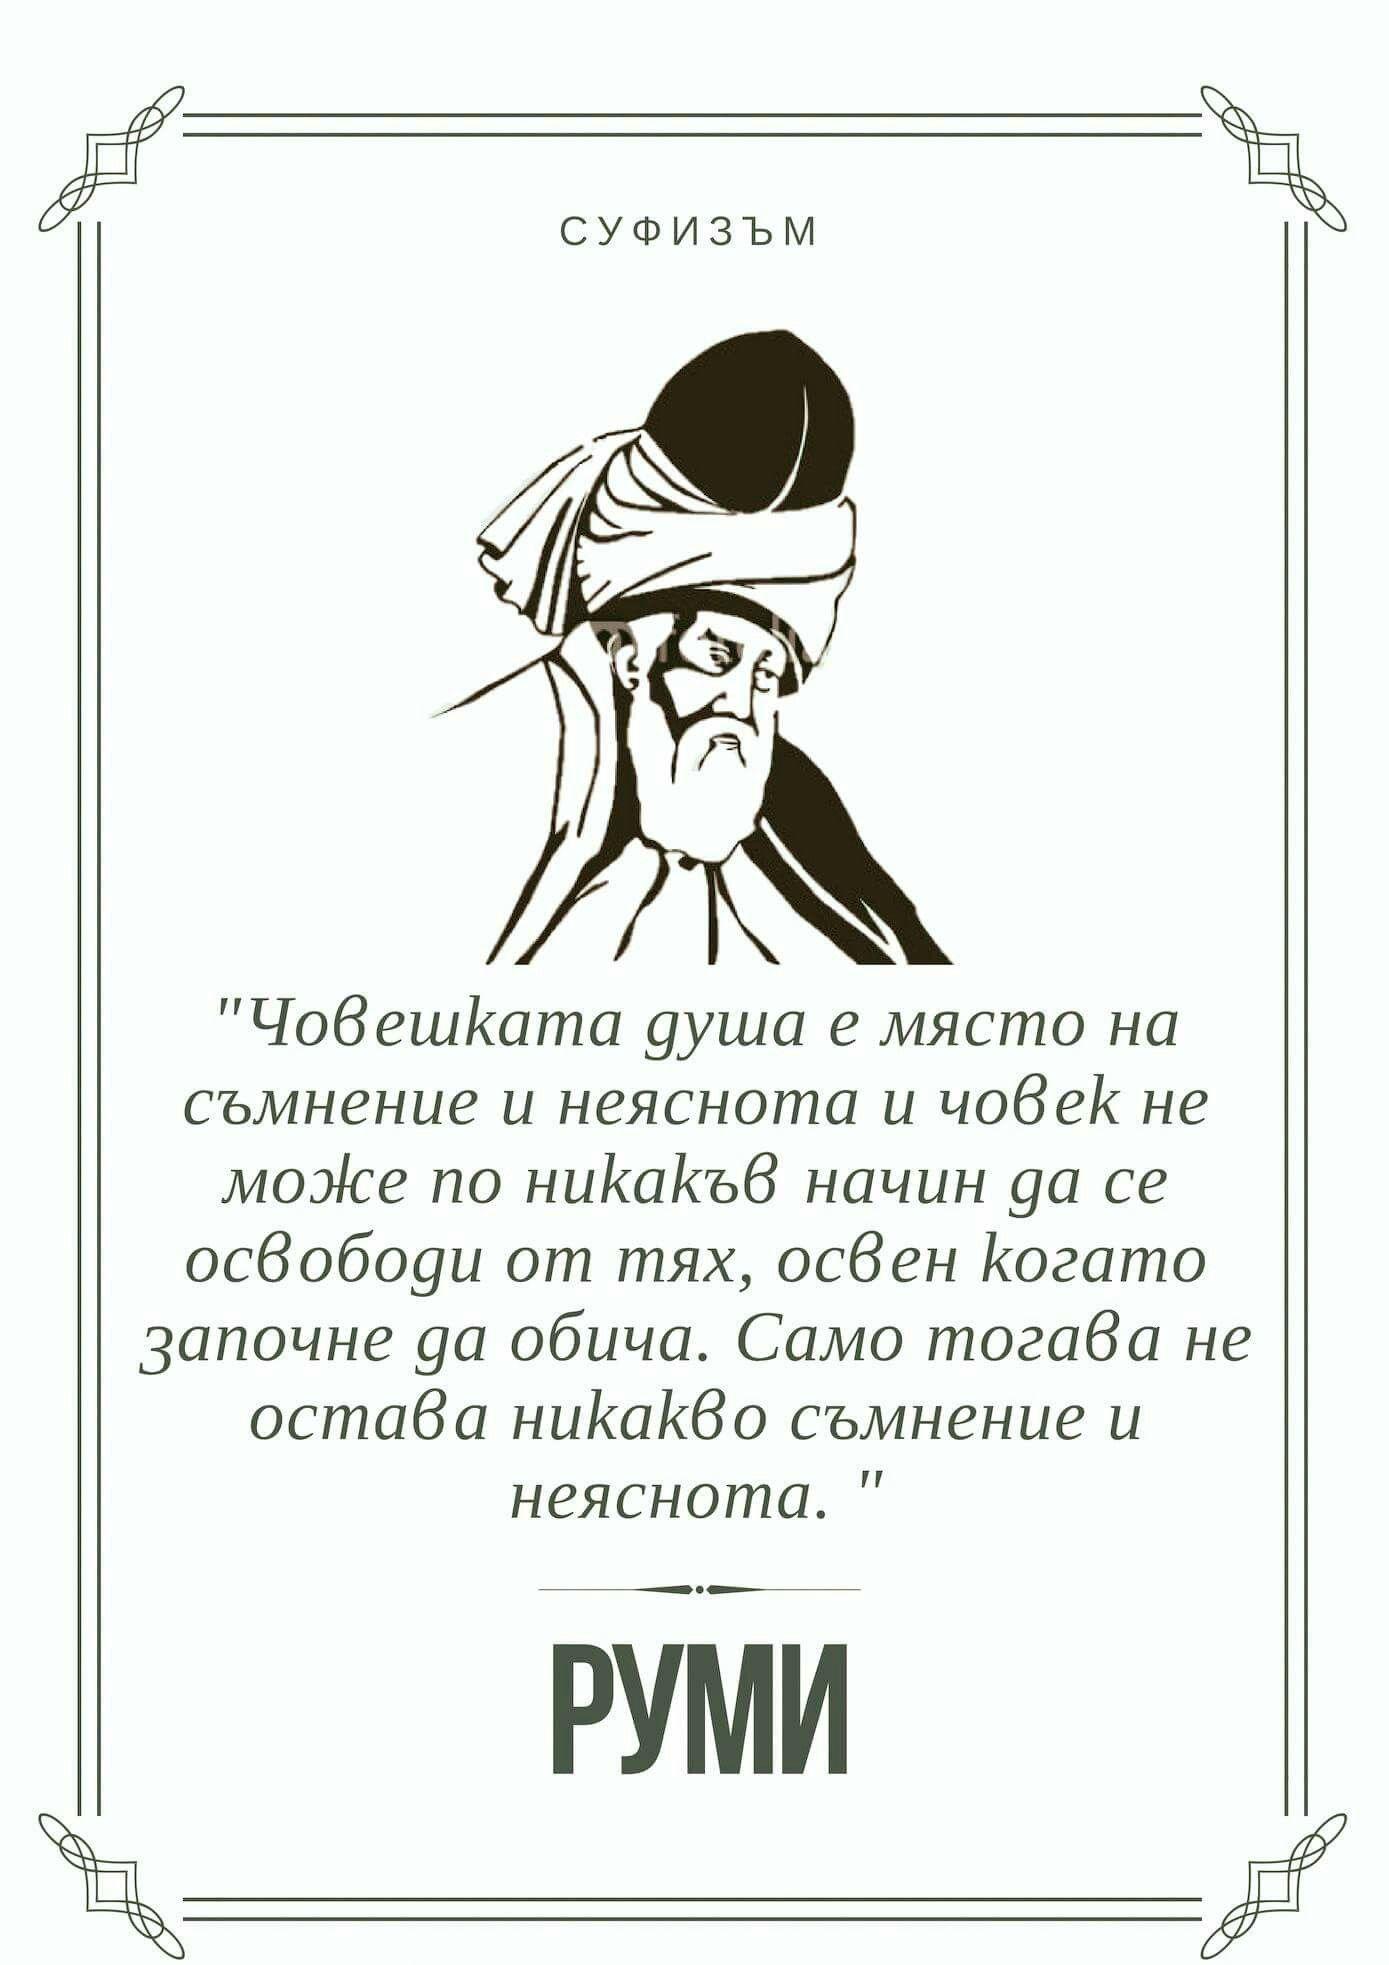 Pin by Valeriq Peychinova on citati Memes, Quotes, Rumi